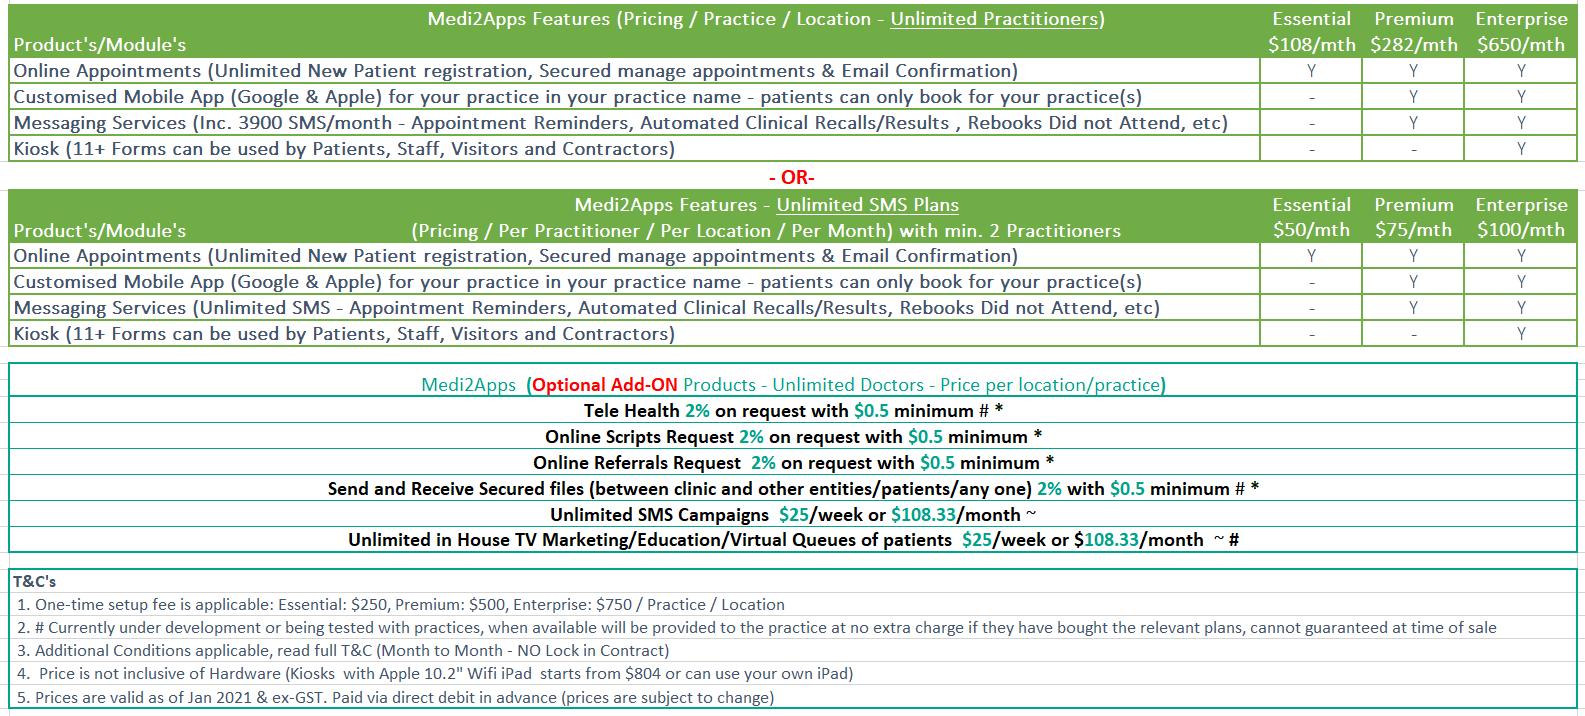 Medi2Apps Simple pricing Jan 2021